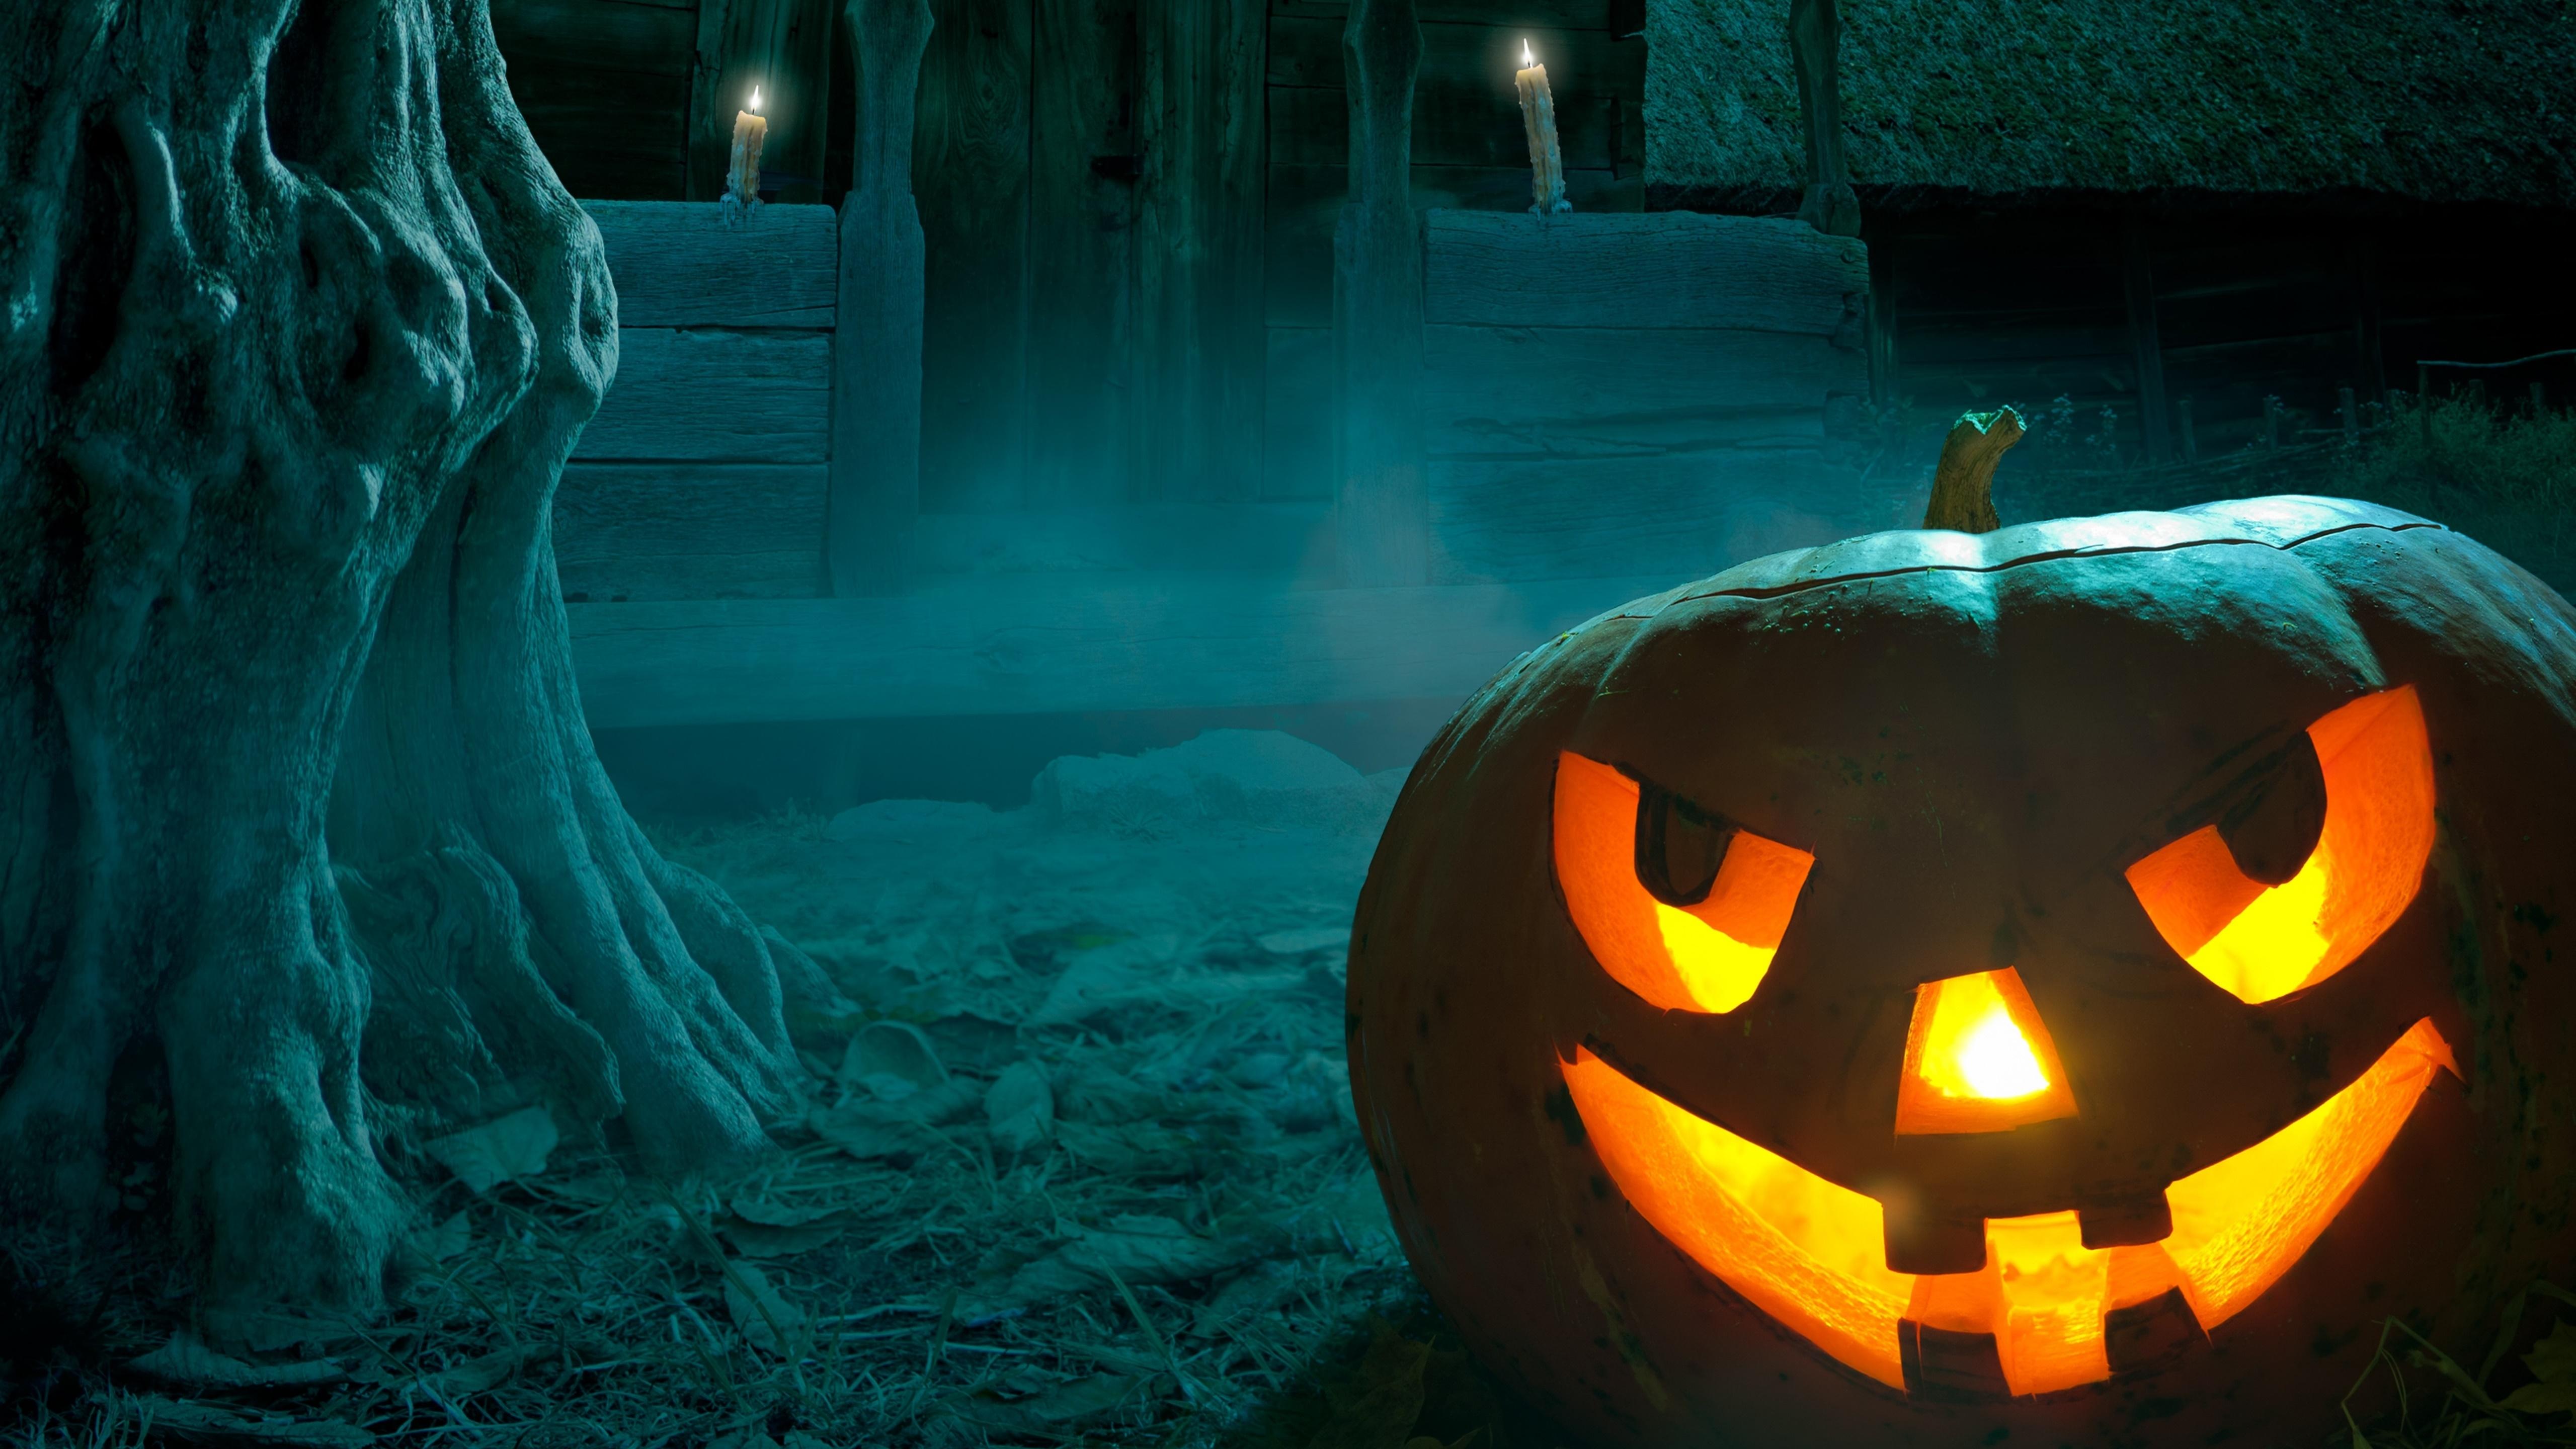 Spooky Jack O'lantern on Halloween night wallpaper